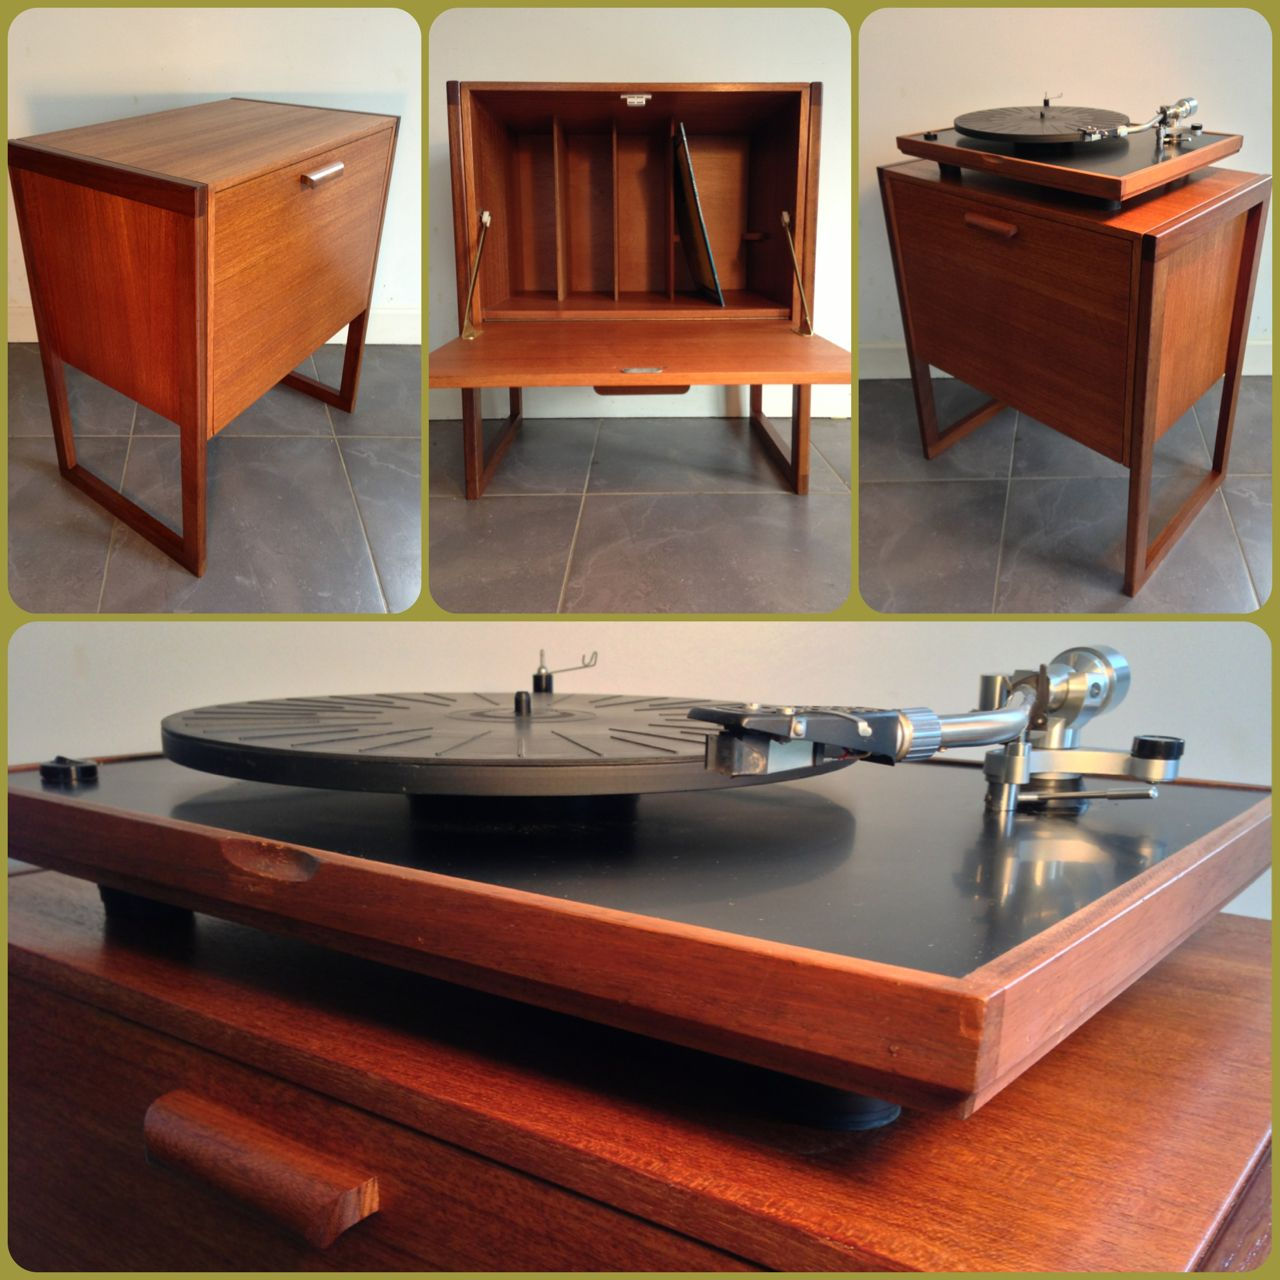 Best Kitchen Gallery: Record Cabi Original 60's Teak Furniture Pinterest of Cabinet Storage Turntable on rachelxblog.com